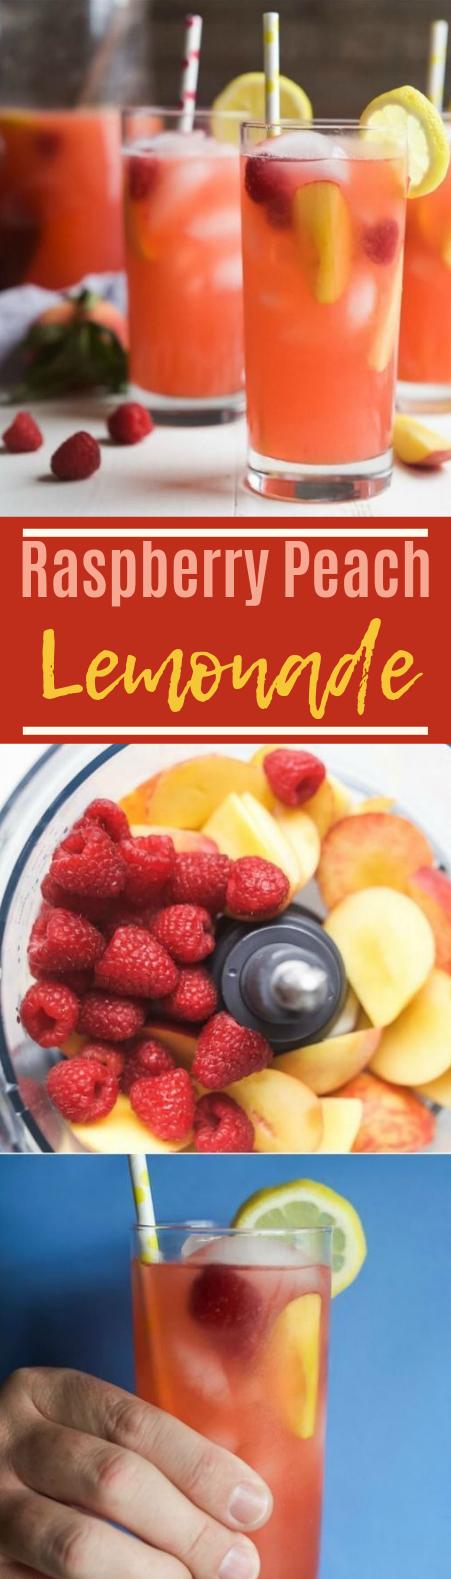 Raspberry Peach Lemonade #summer #drinks